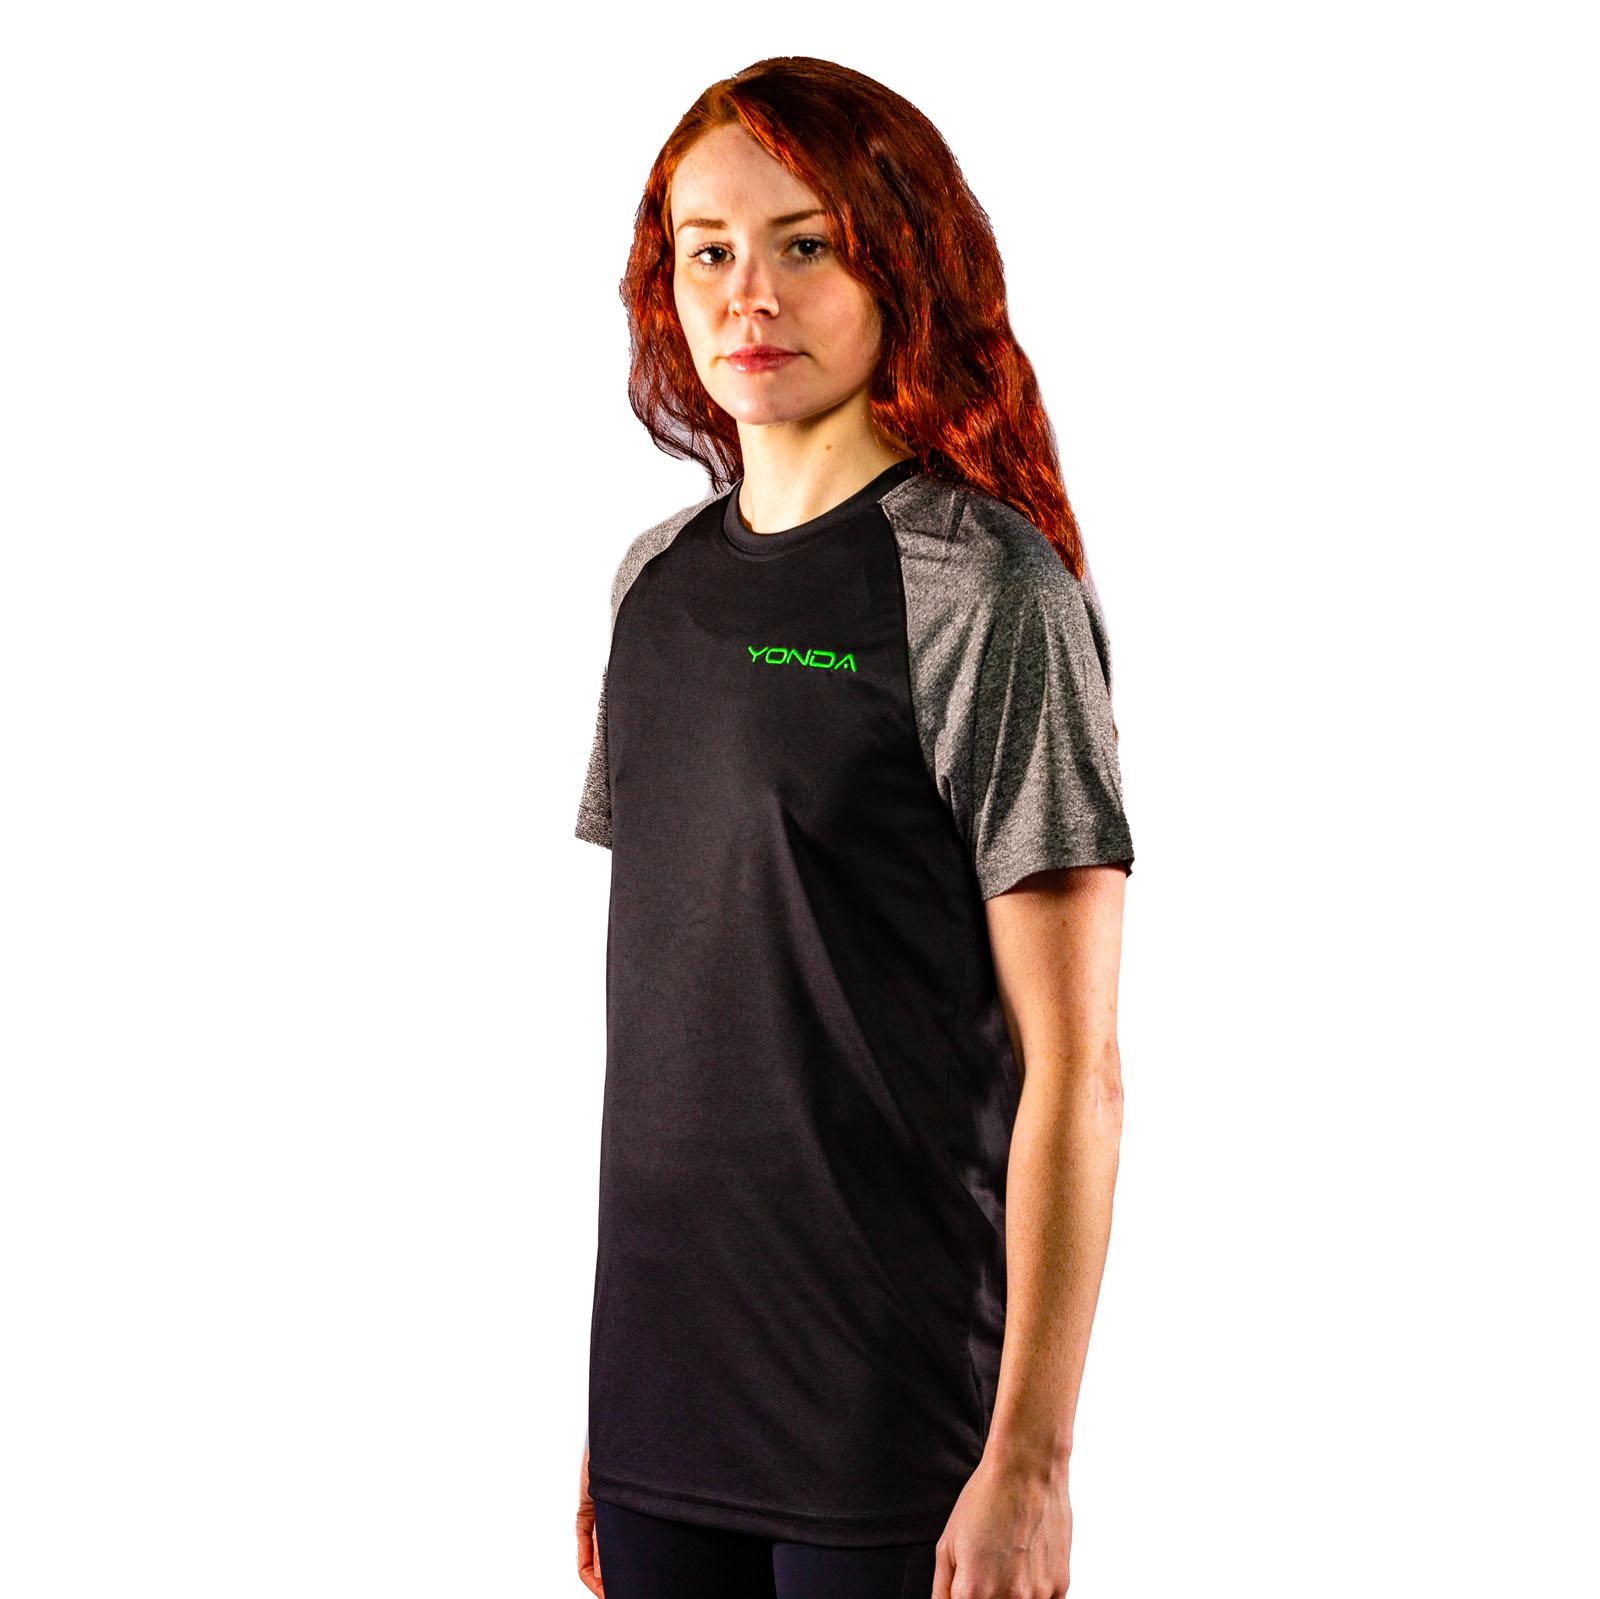 Unisex Performance Tee shirt